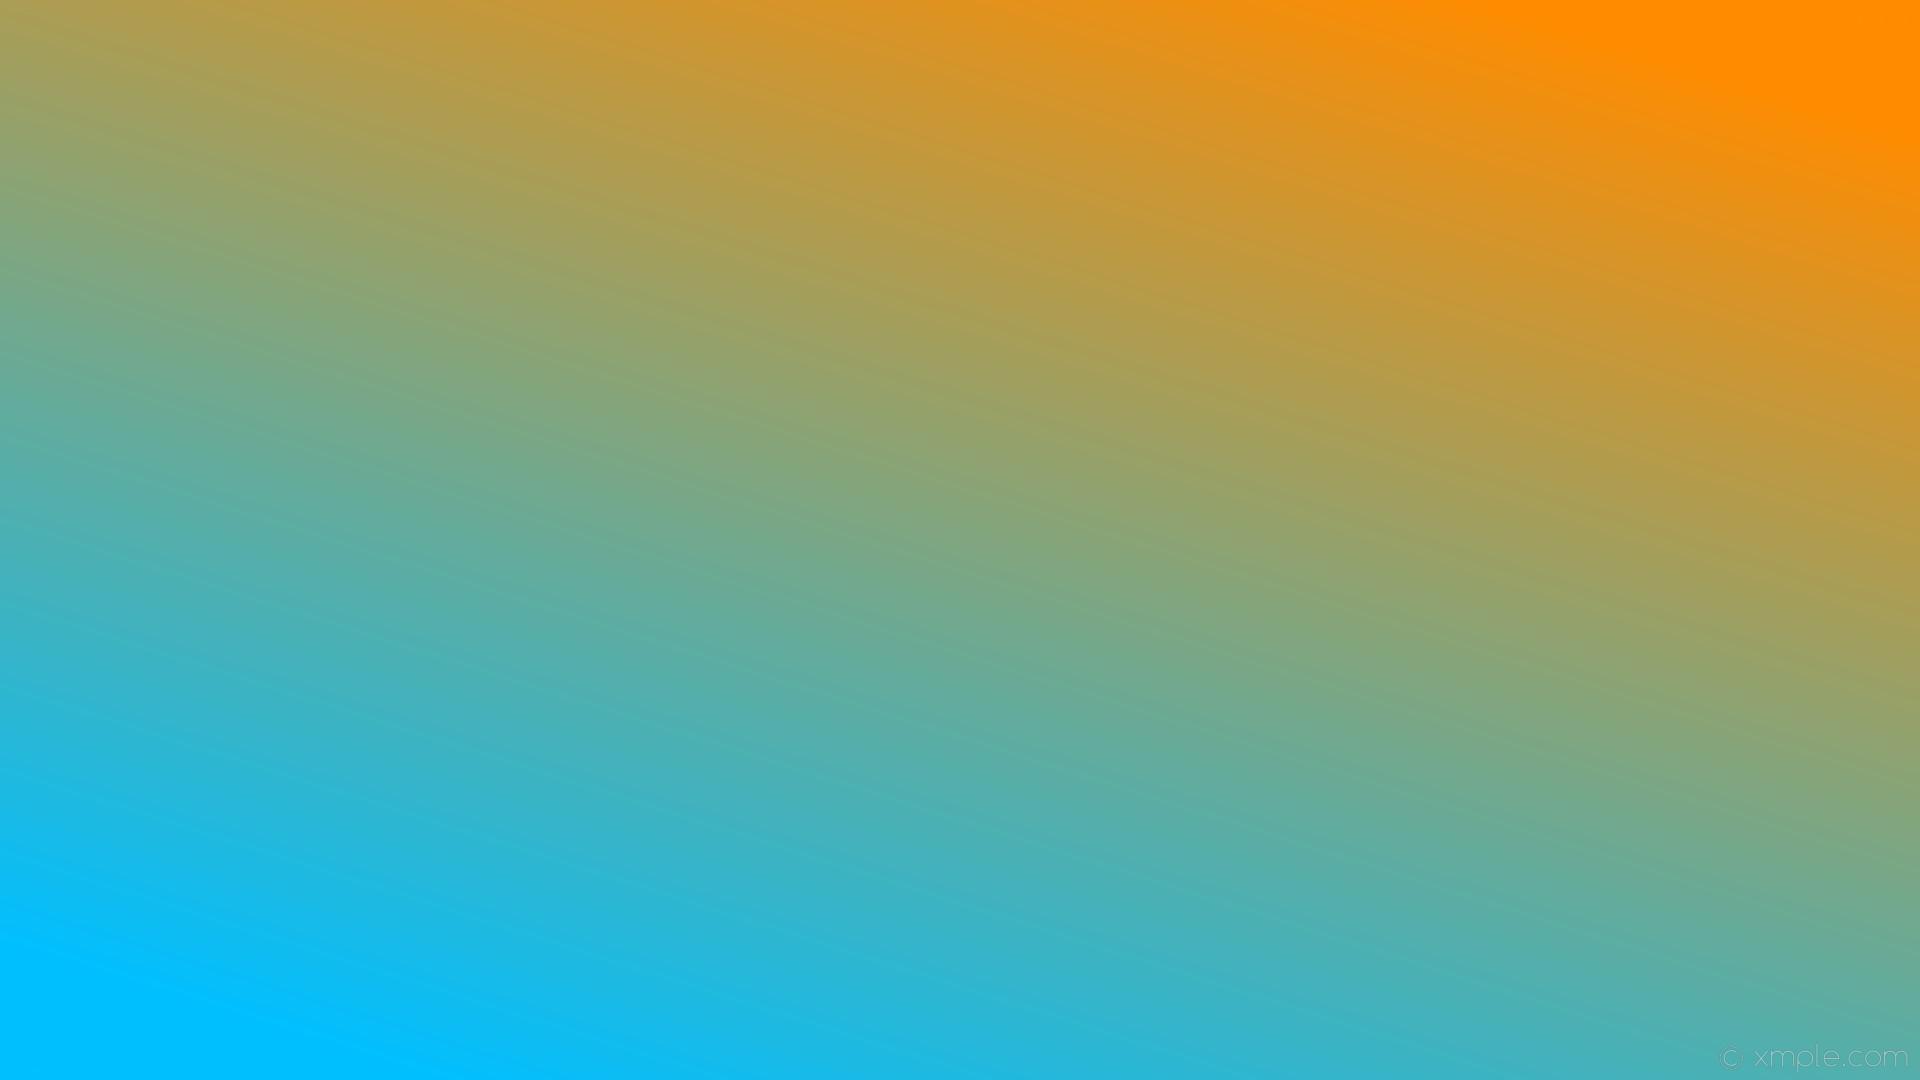 wallpaper linear orange gradient blue dark orange deep sky blue #ff8c00  #00bfff 45°